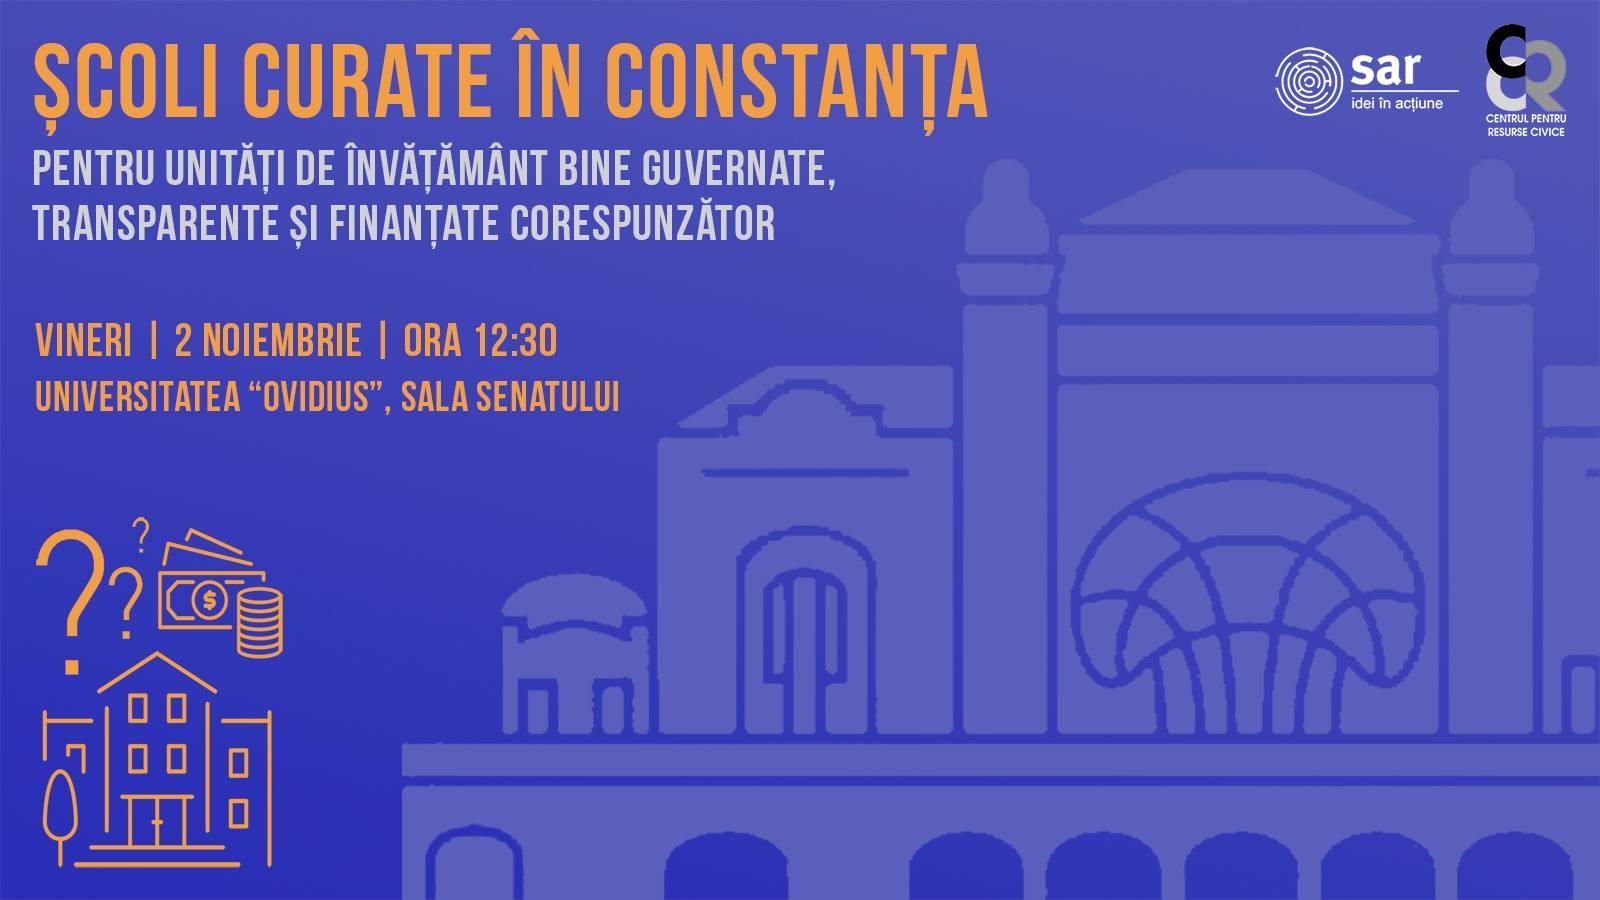 Vineri începem turneul Școli Curate la Constanța!